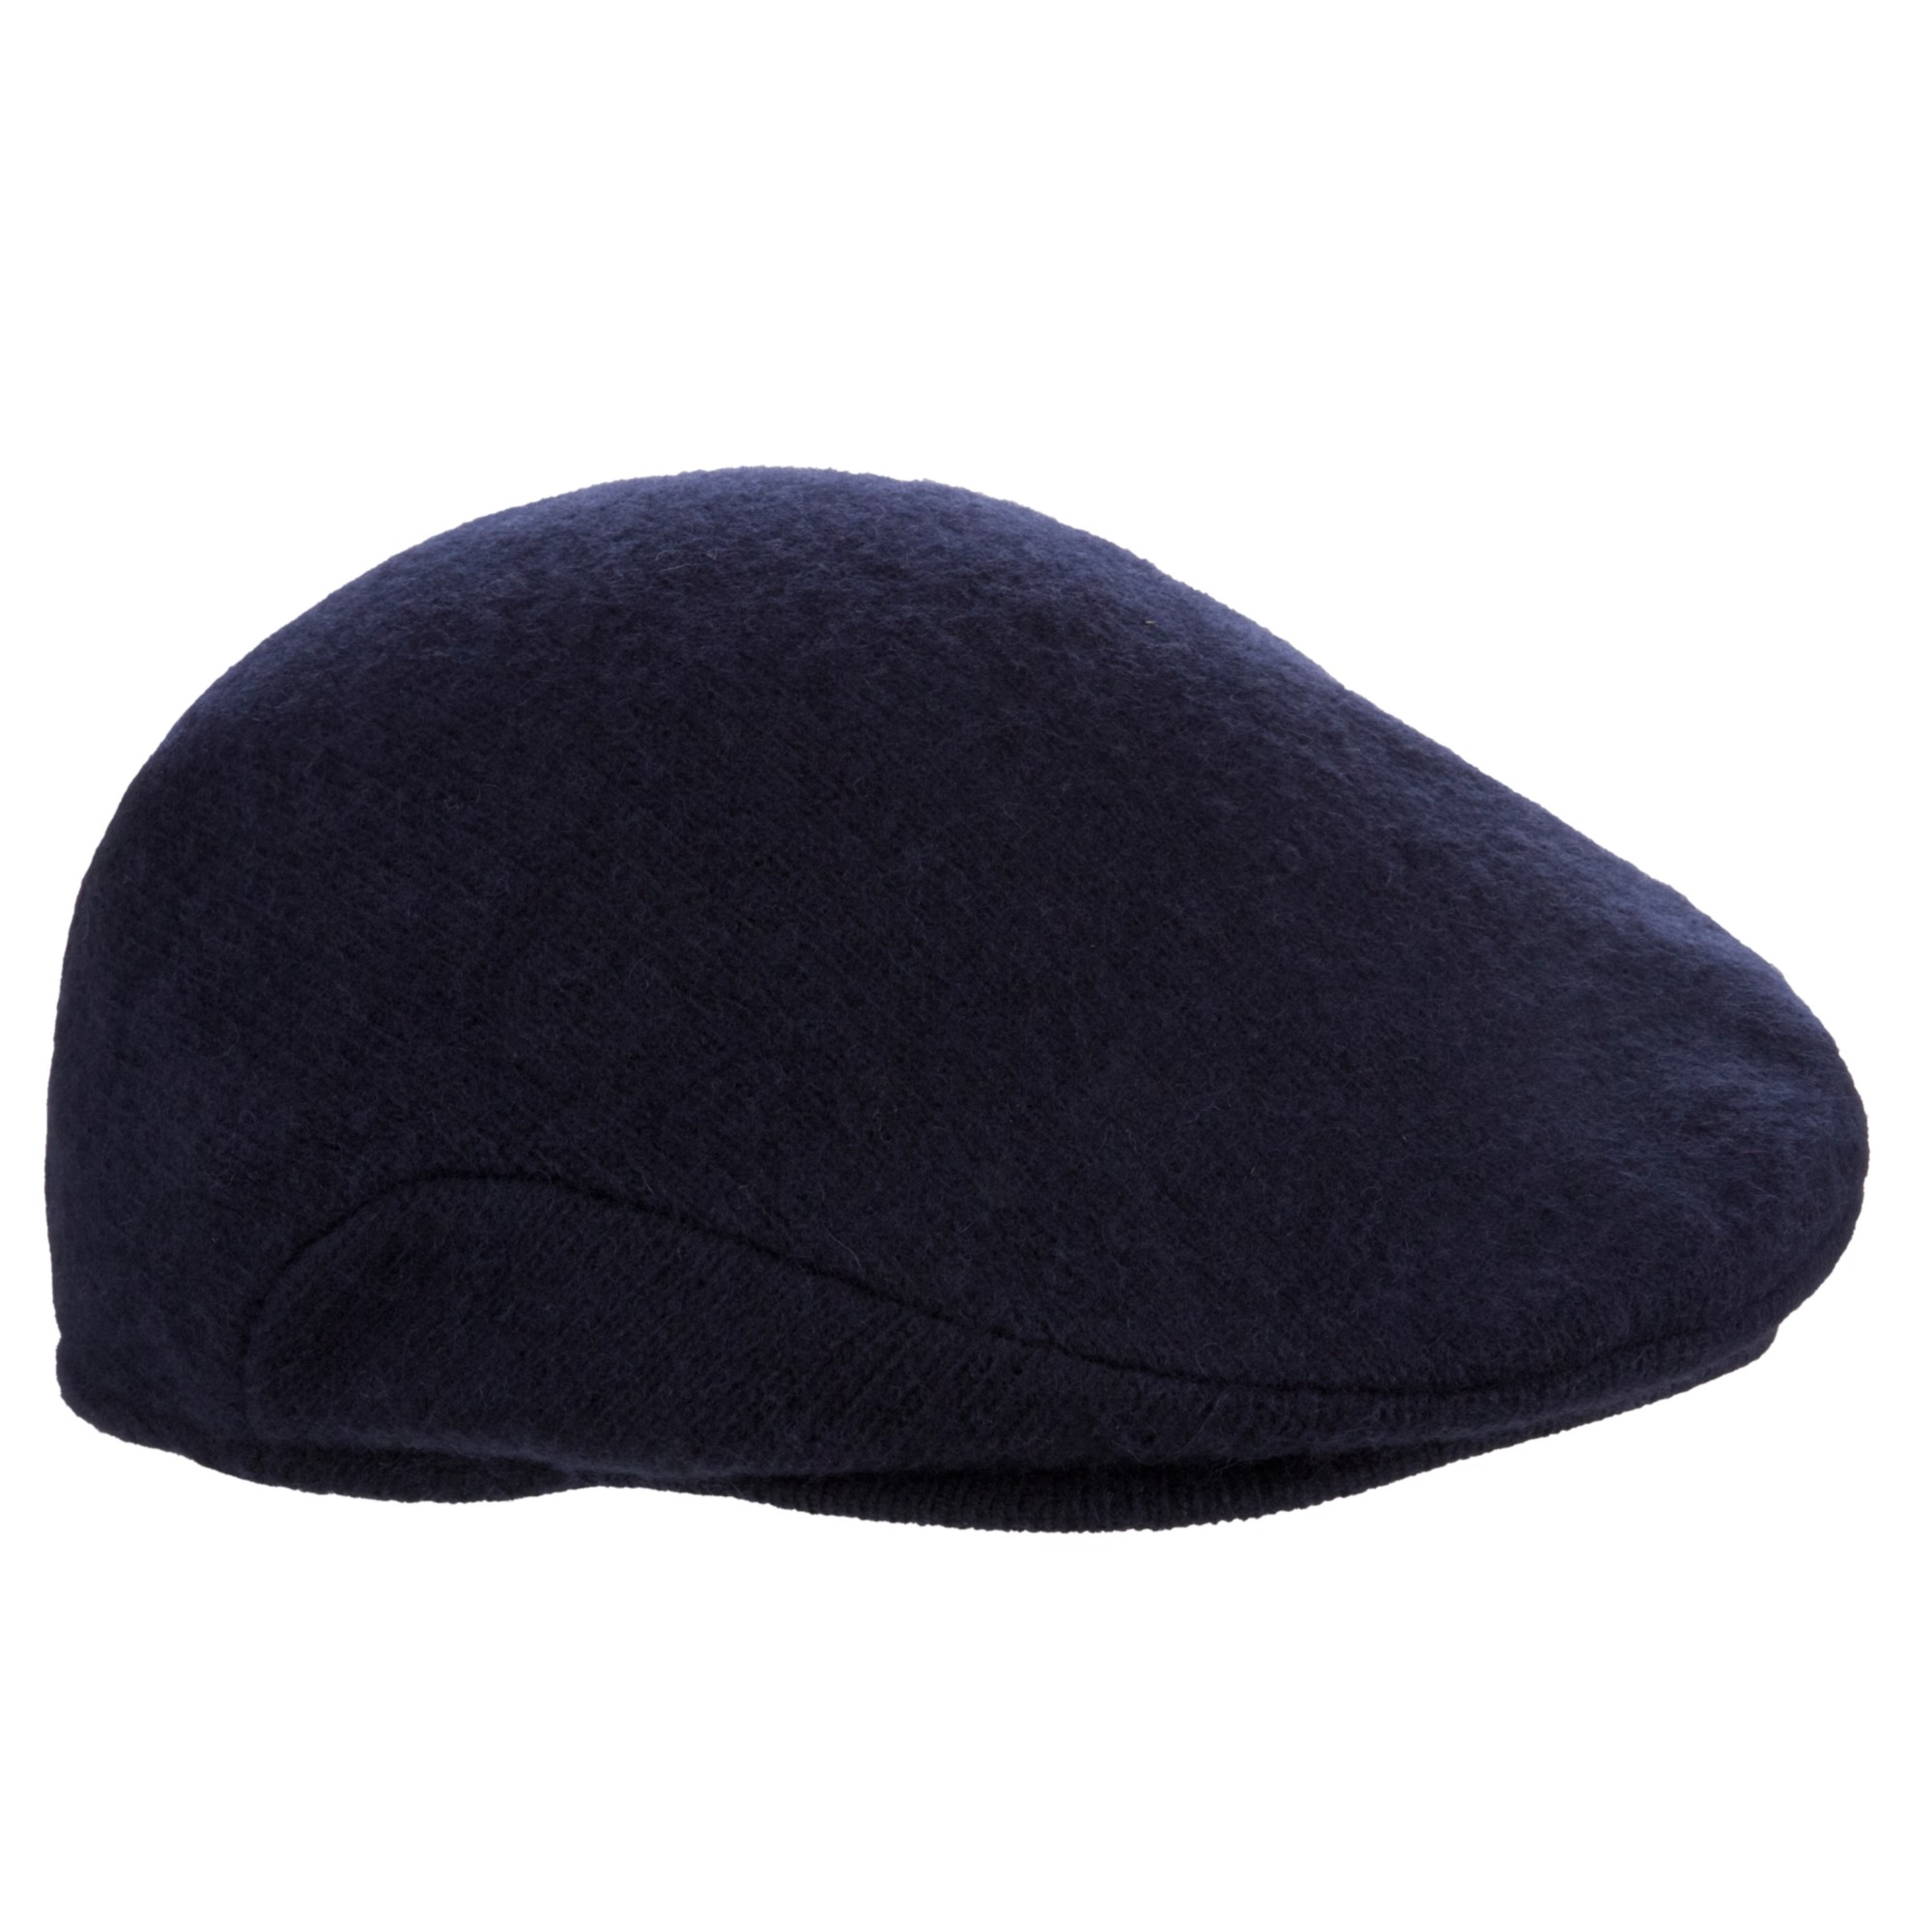 625072c5c Polo Ralph Lauren Wool Blend Flat Cap in Blue for Men - Lyst